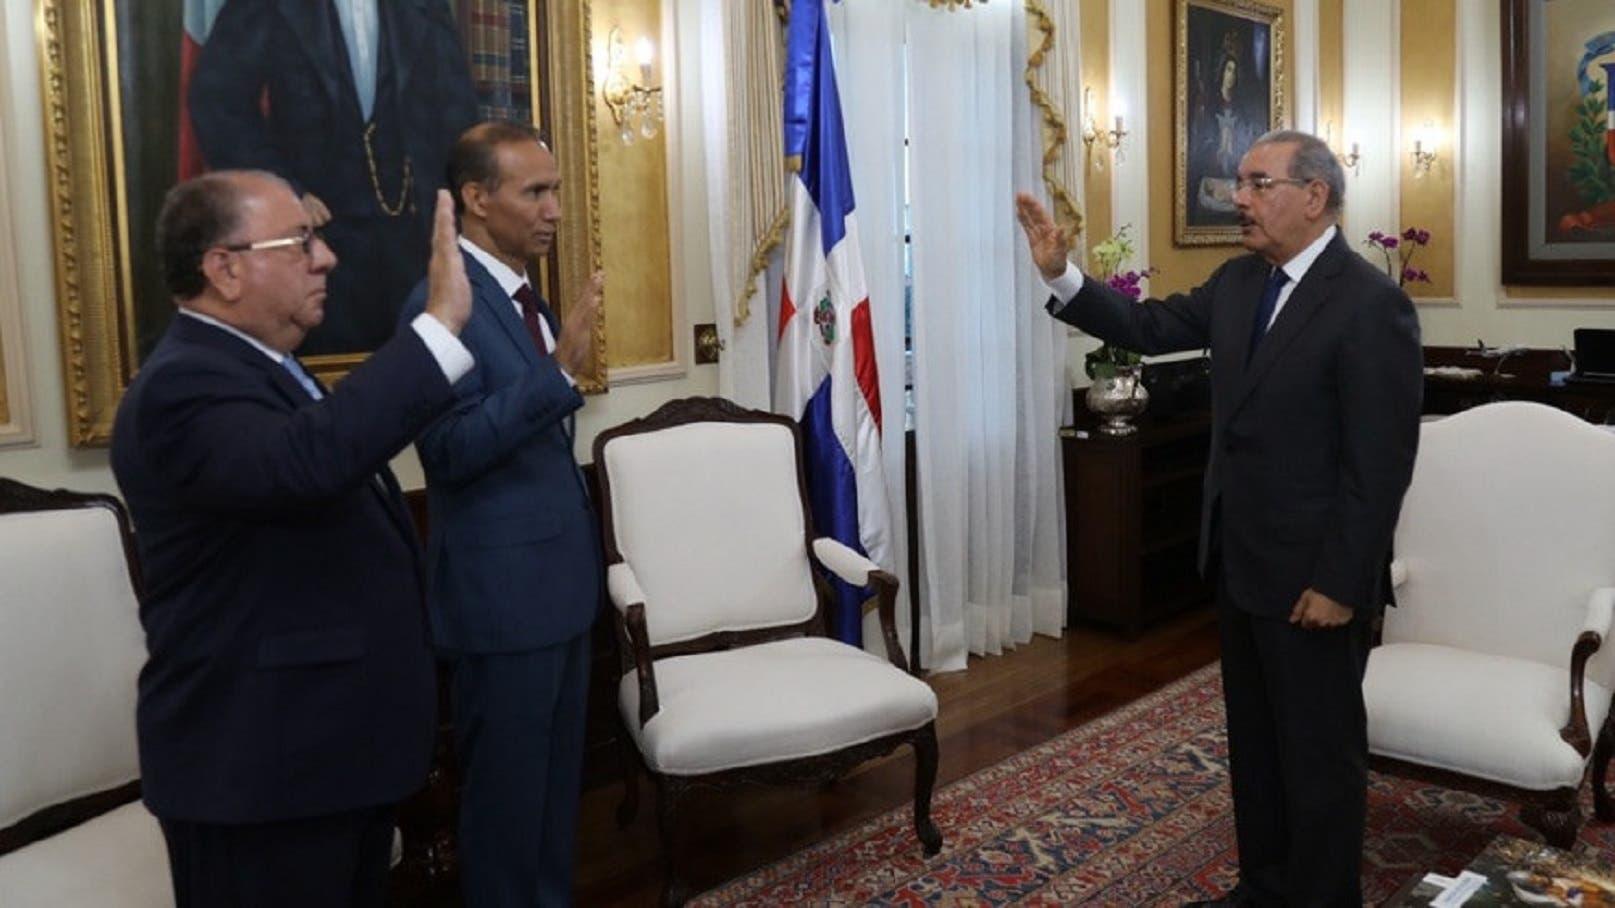 Danilo Medina juramenta a José Ramón Fadul y Winston Santos